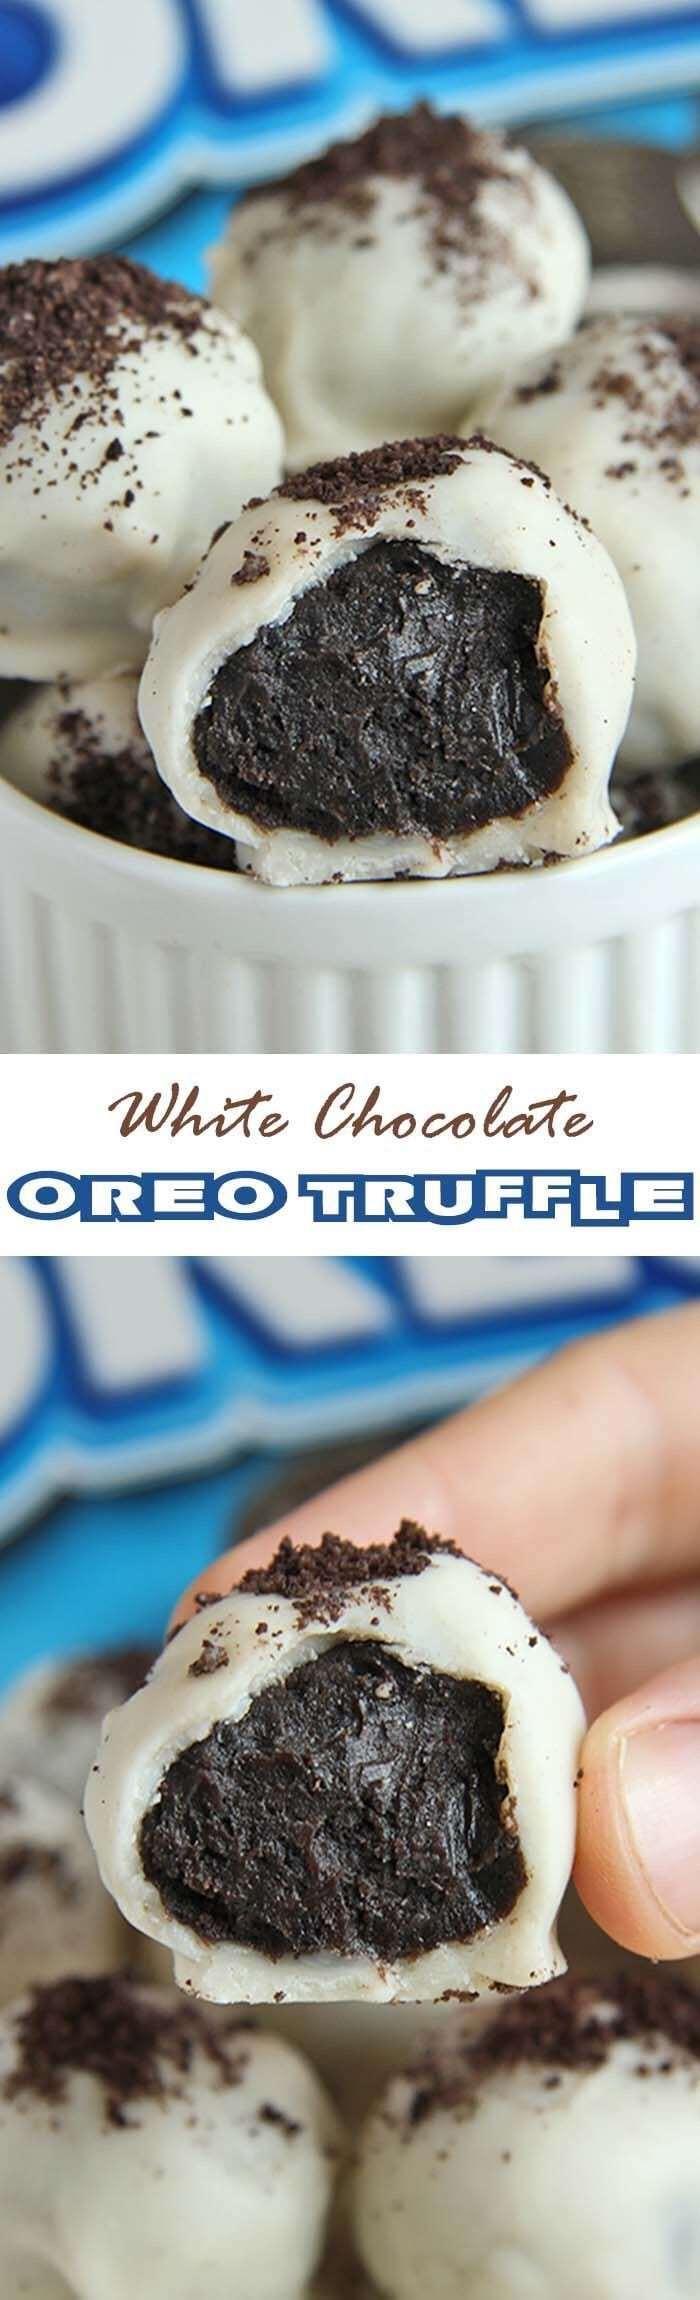 White Chocolate Oreo Truffle